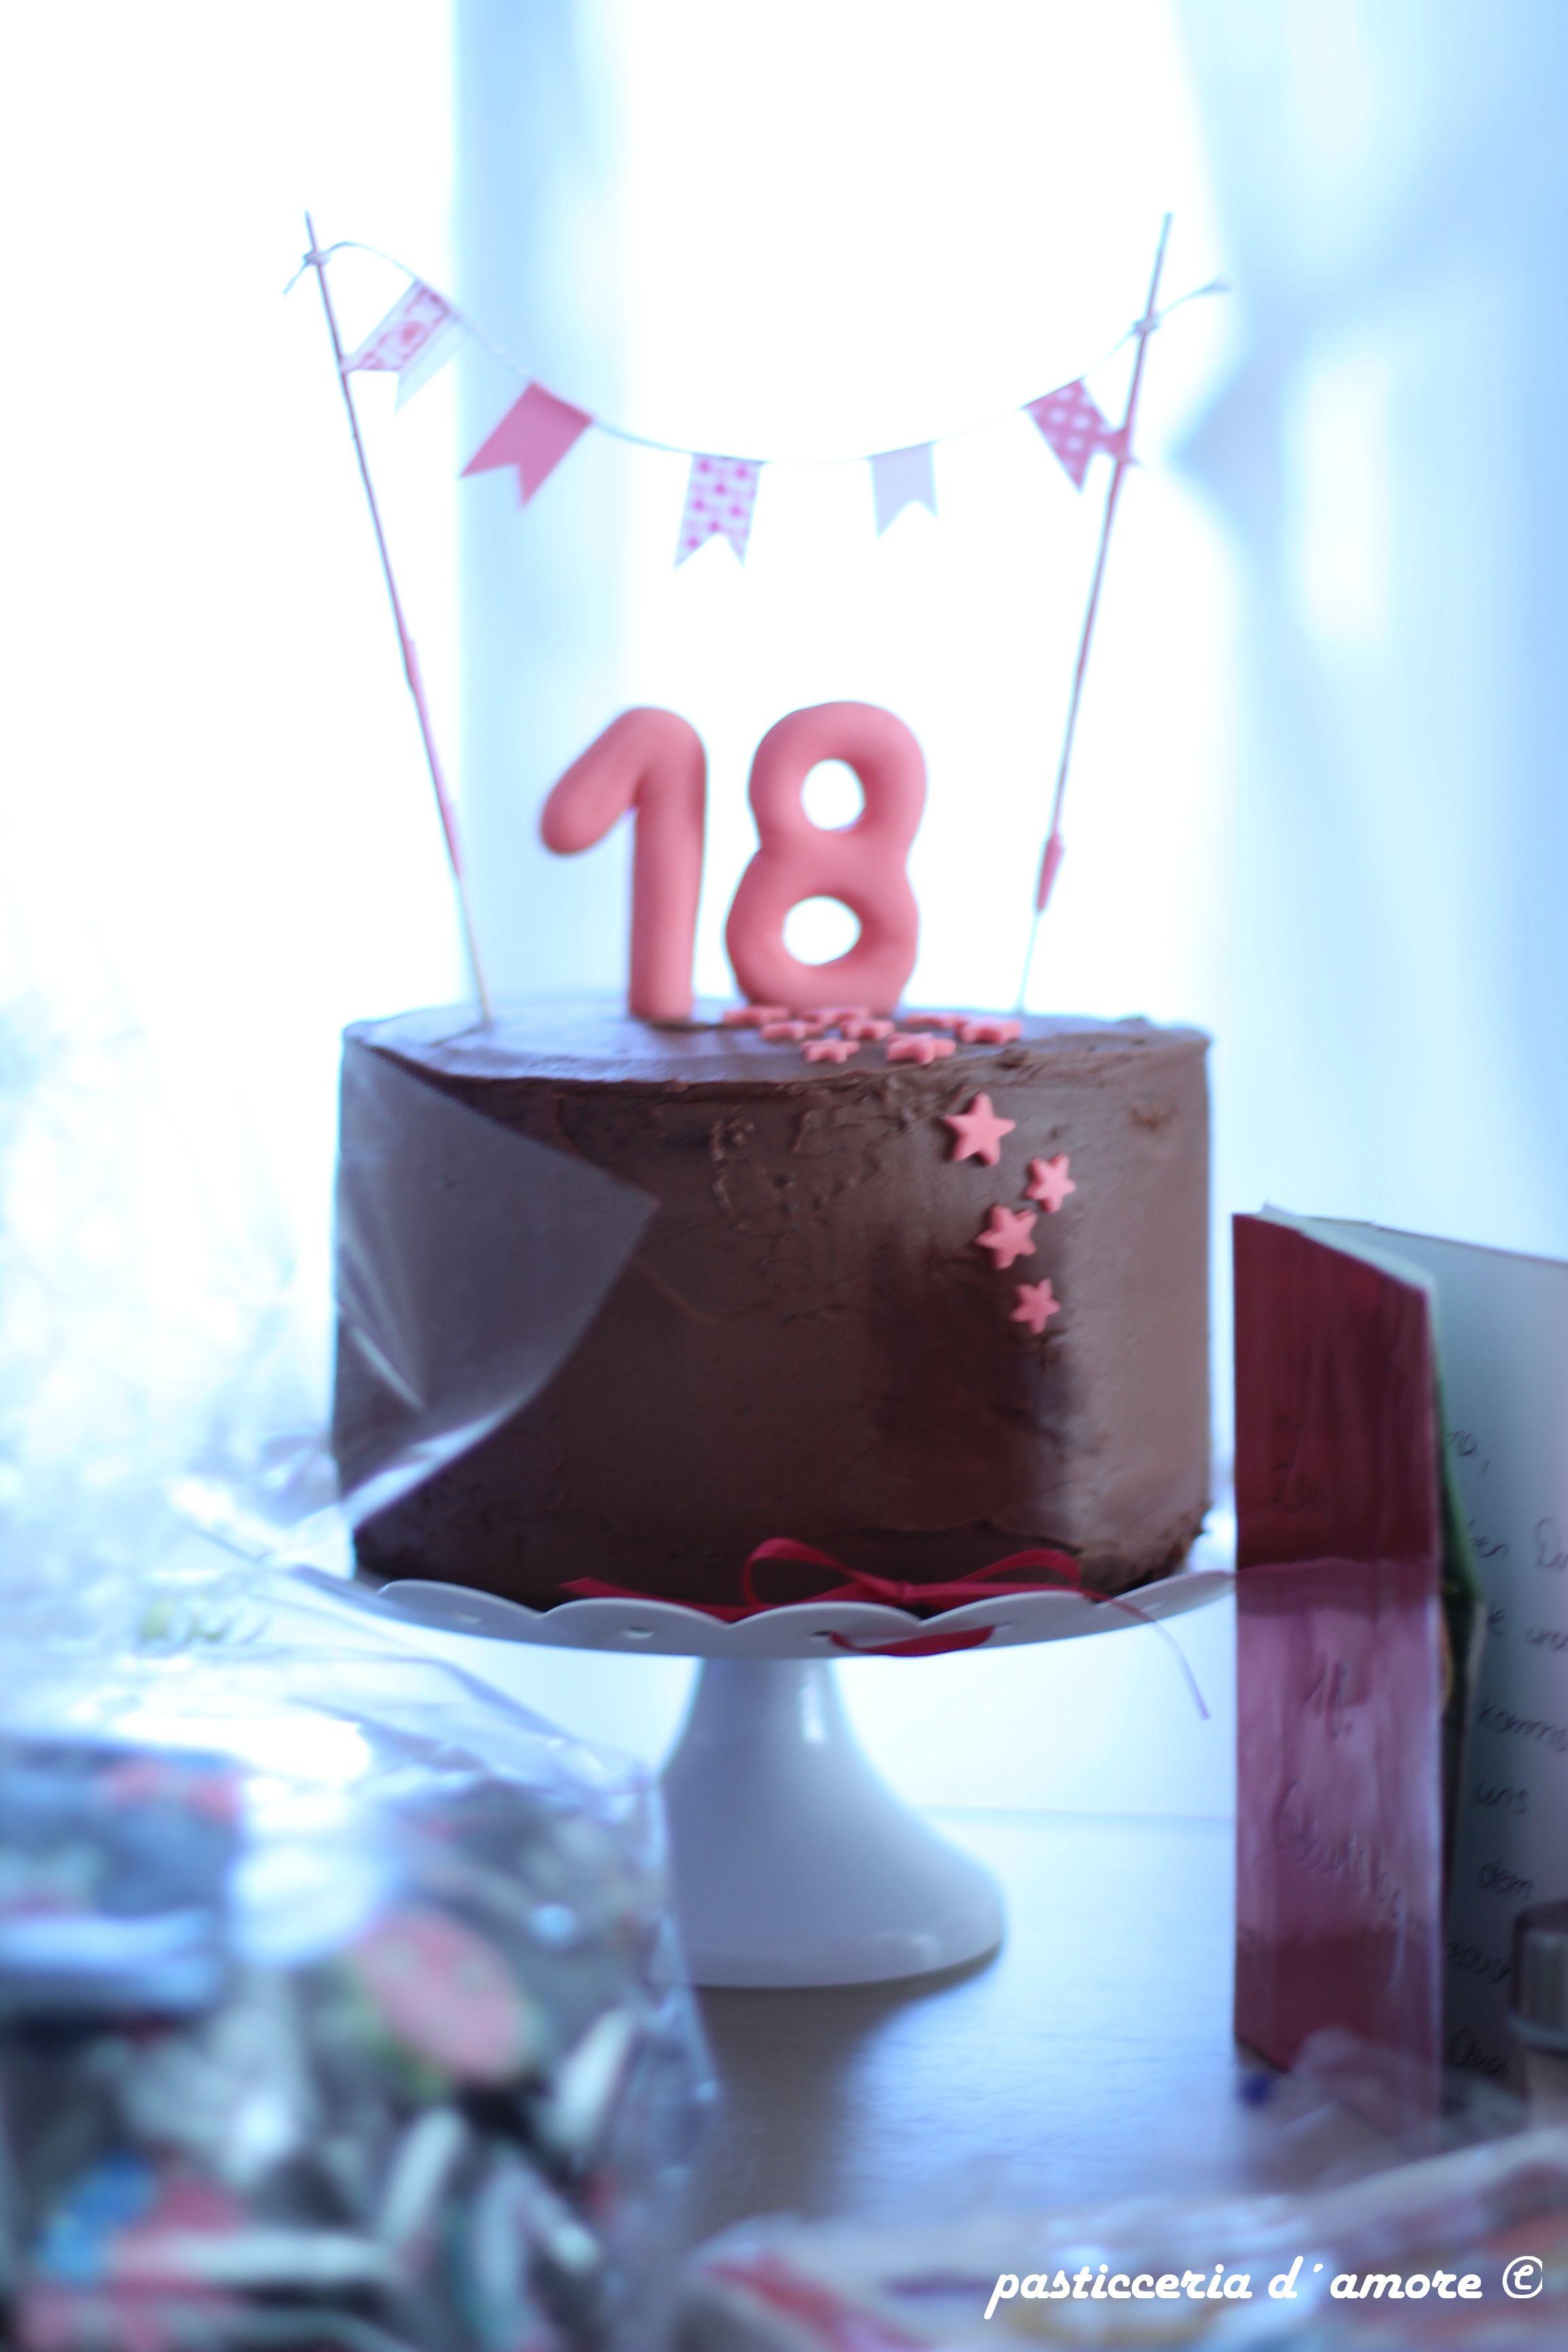 Schoko bananen geburtstagstorte zum 18 geburtstag torta compleanno con banane e cioccolato - Kuchen 18 geburtstag ...